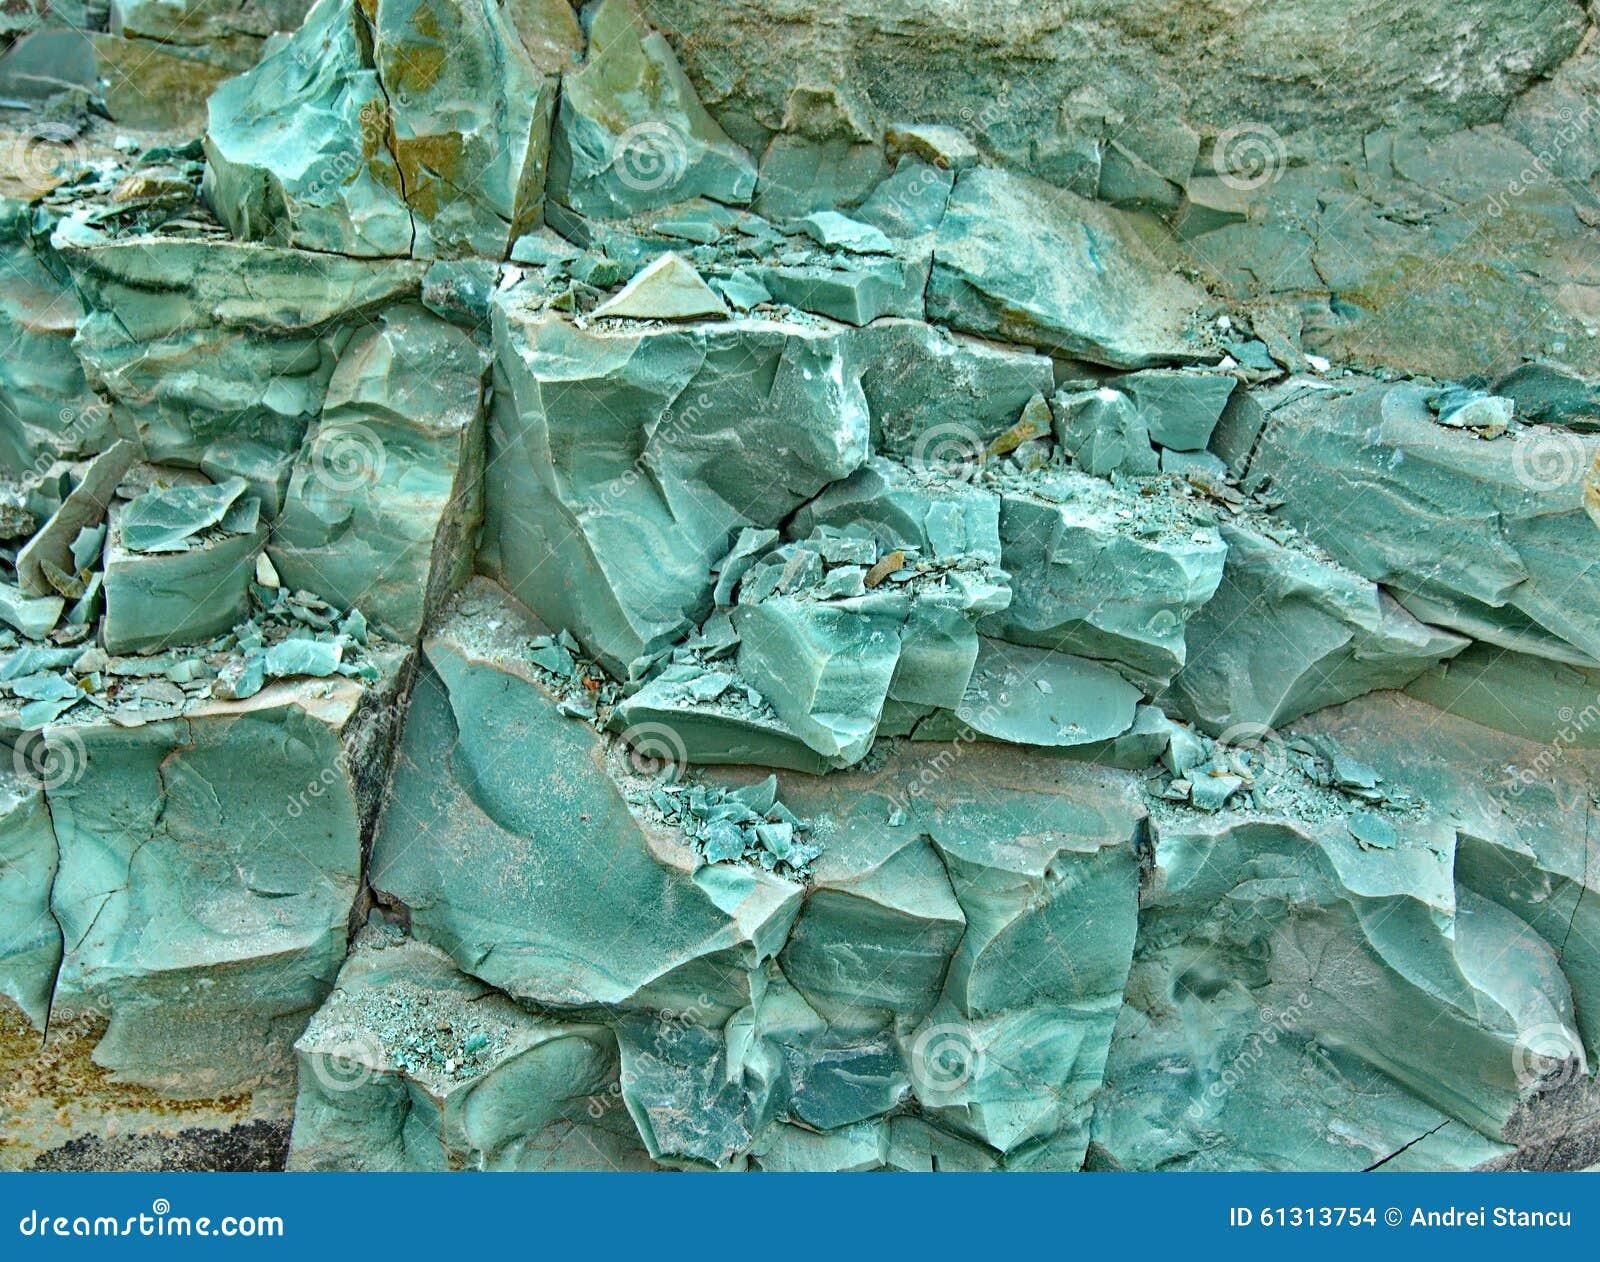 Green Marble Rock : Stone background stock photo image